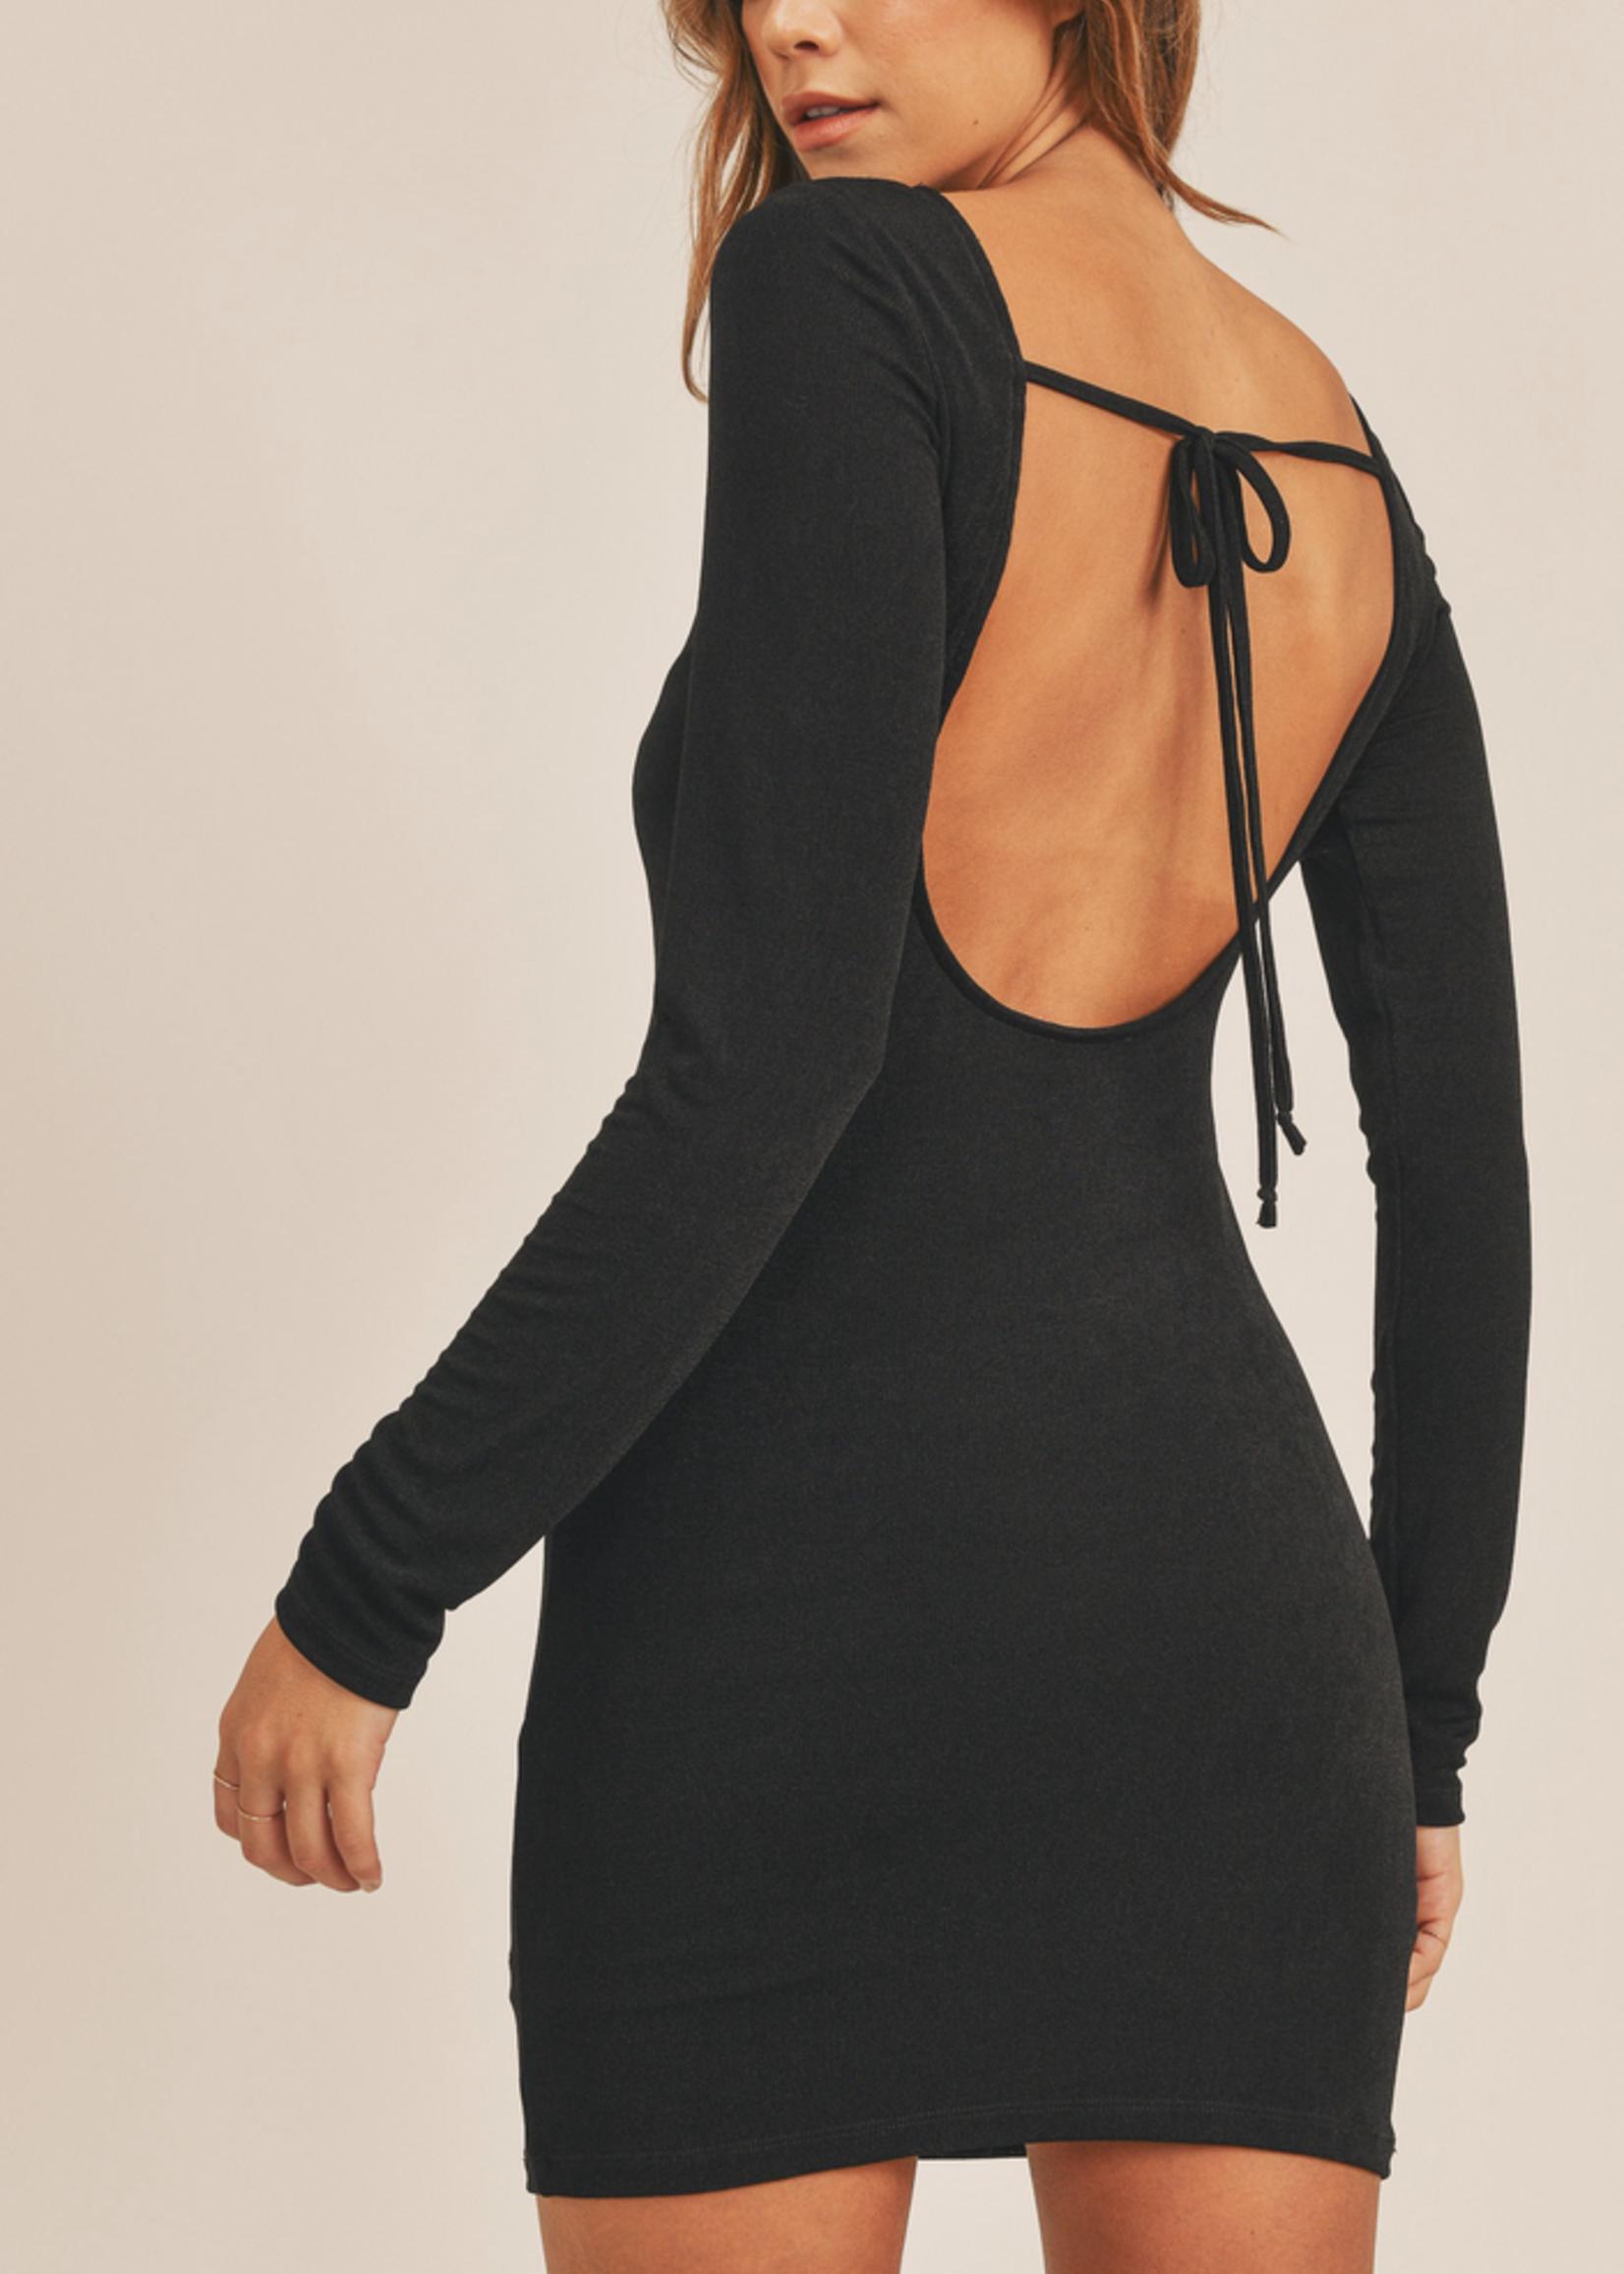 mable hazel dress